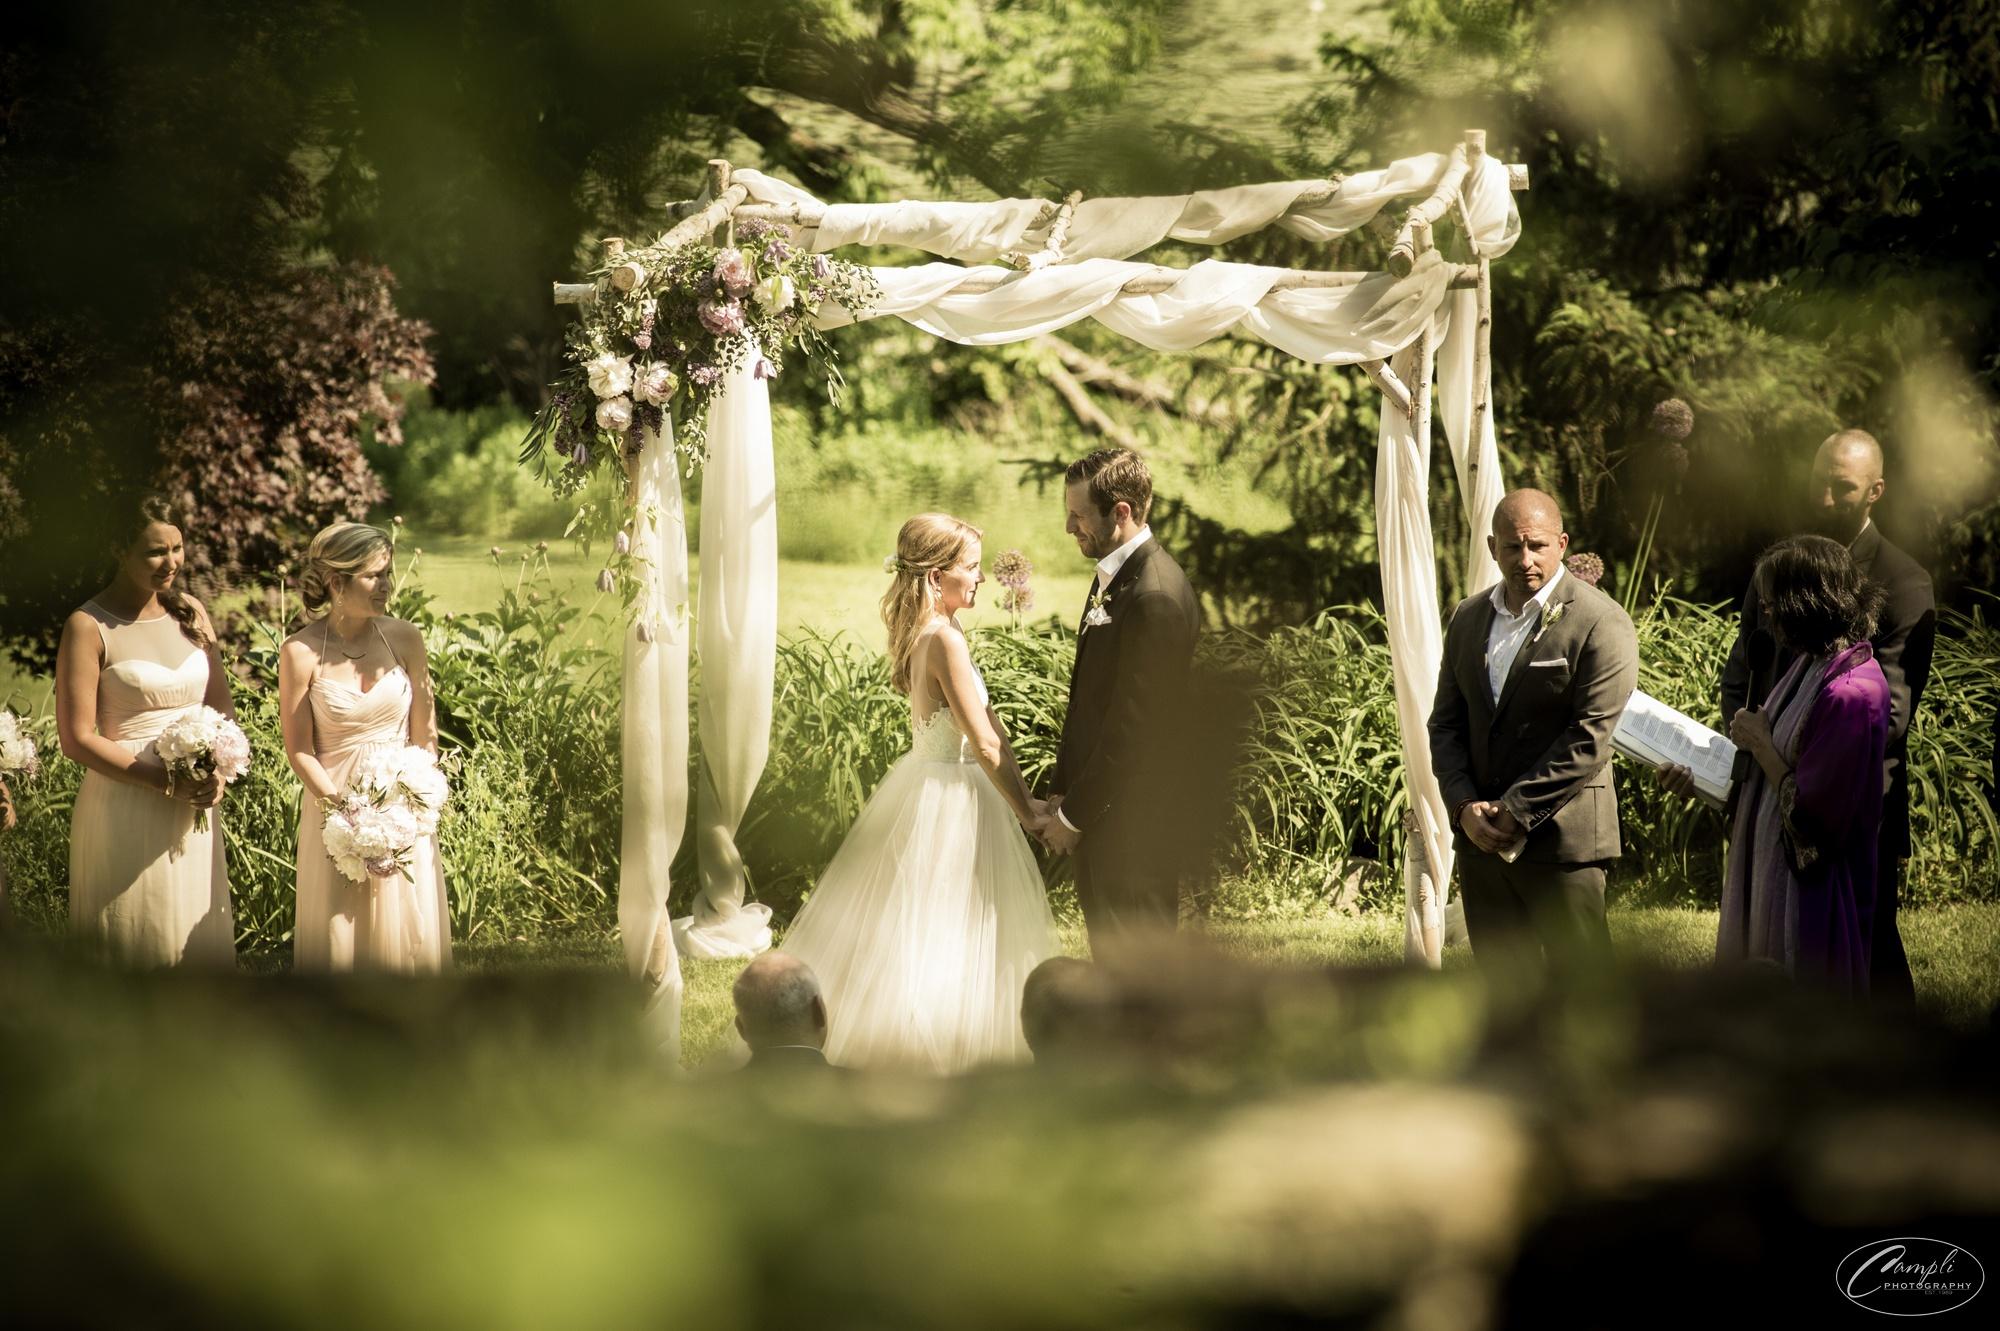 Pennsylvania Rustic Wedding Venues Archives